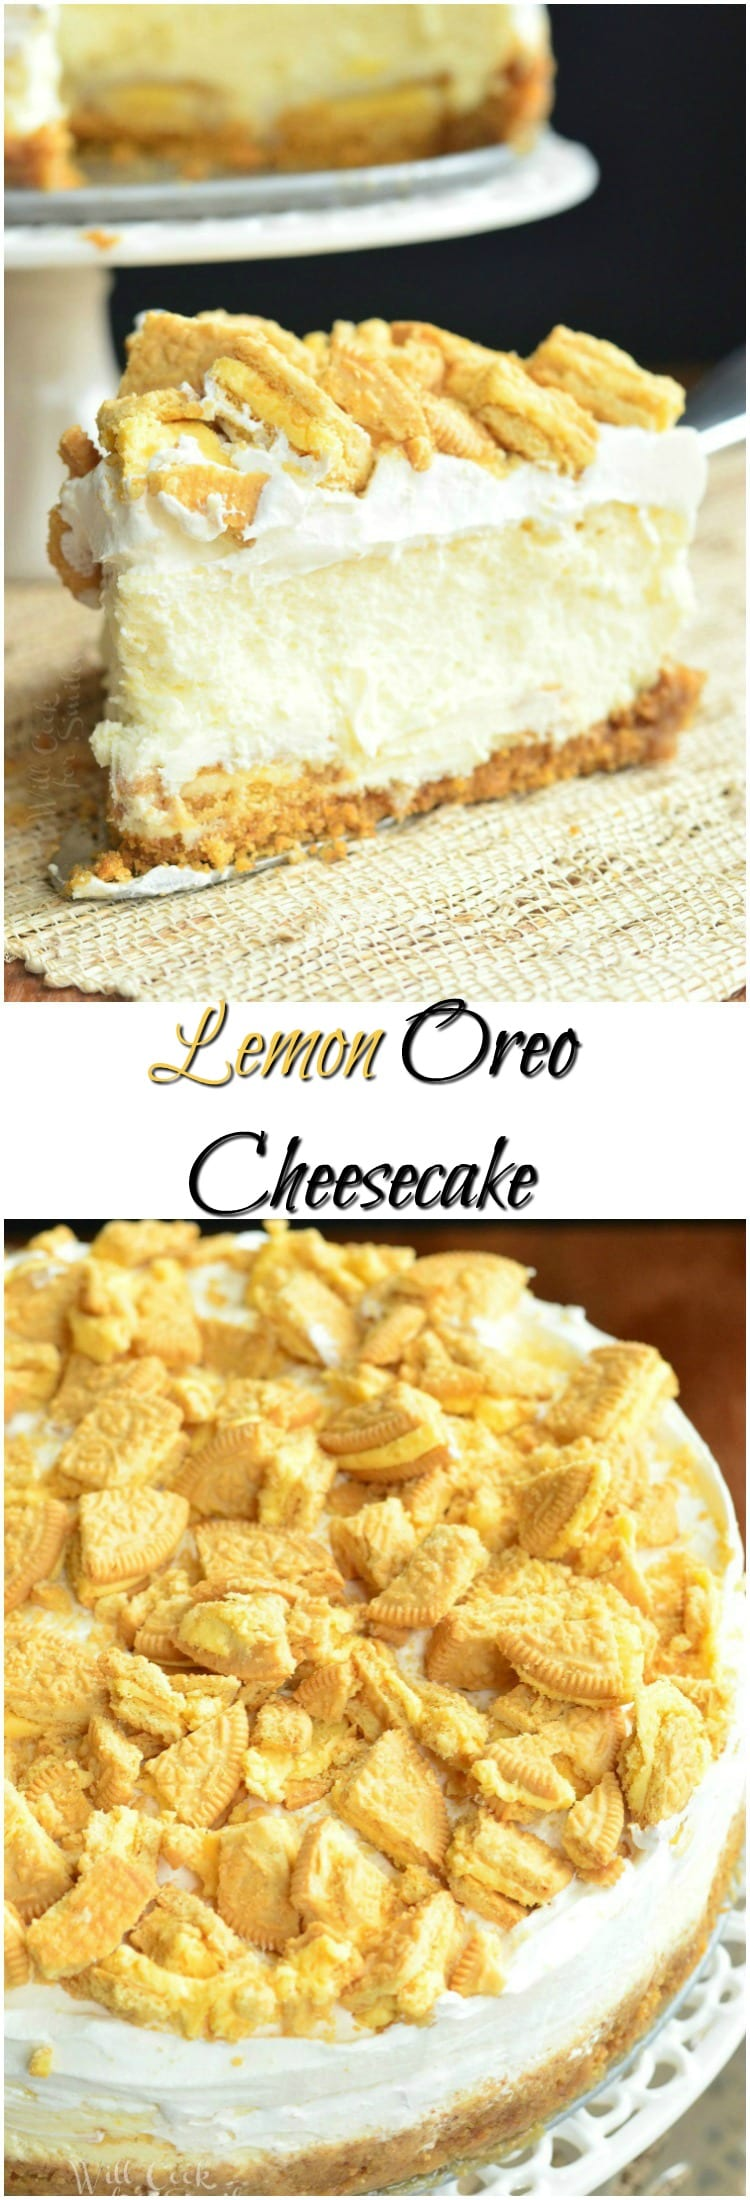 Lemon Oreo Cheesecake collage